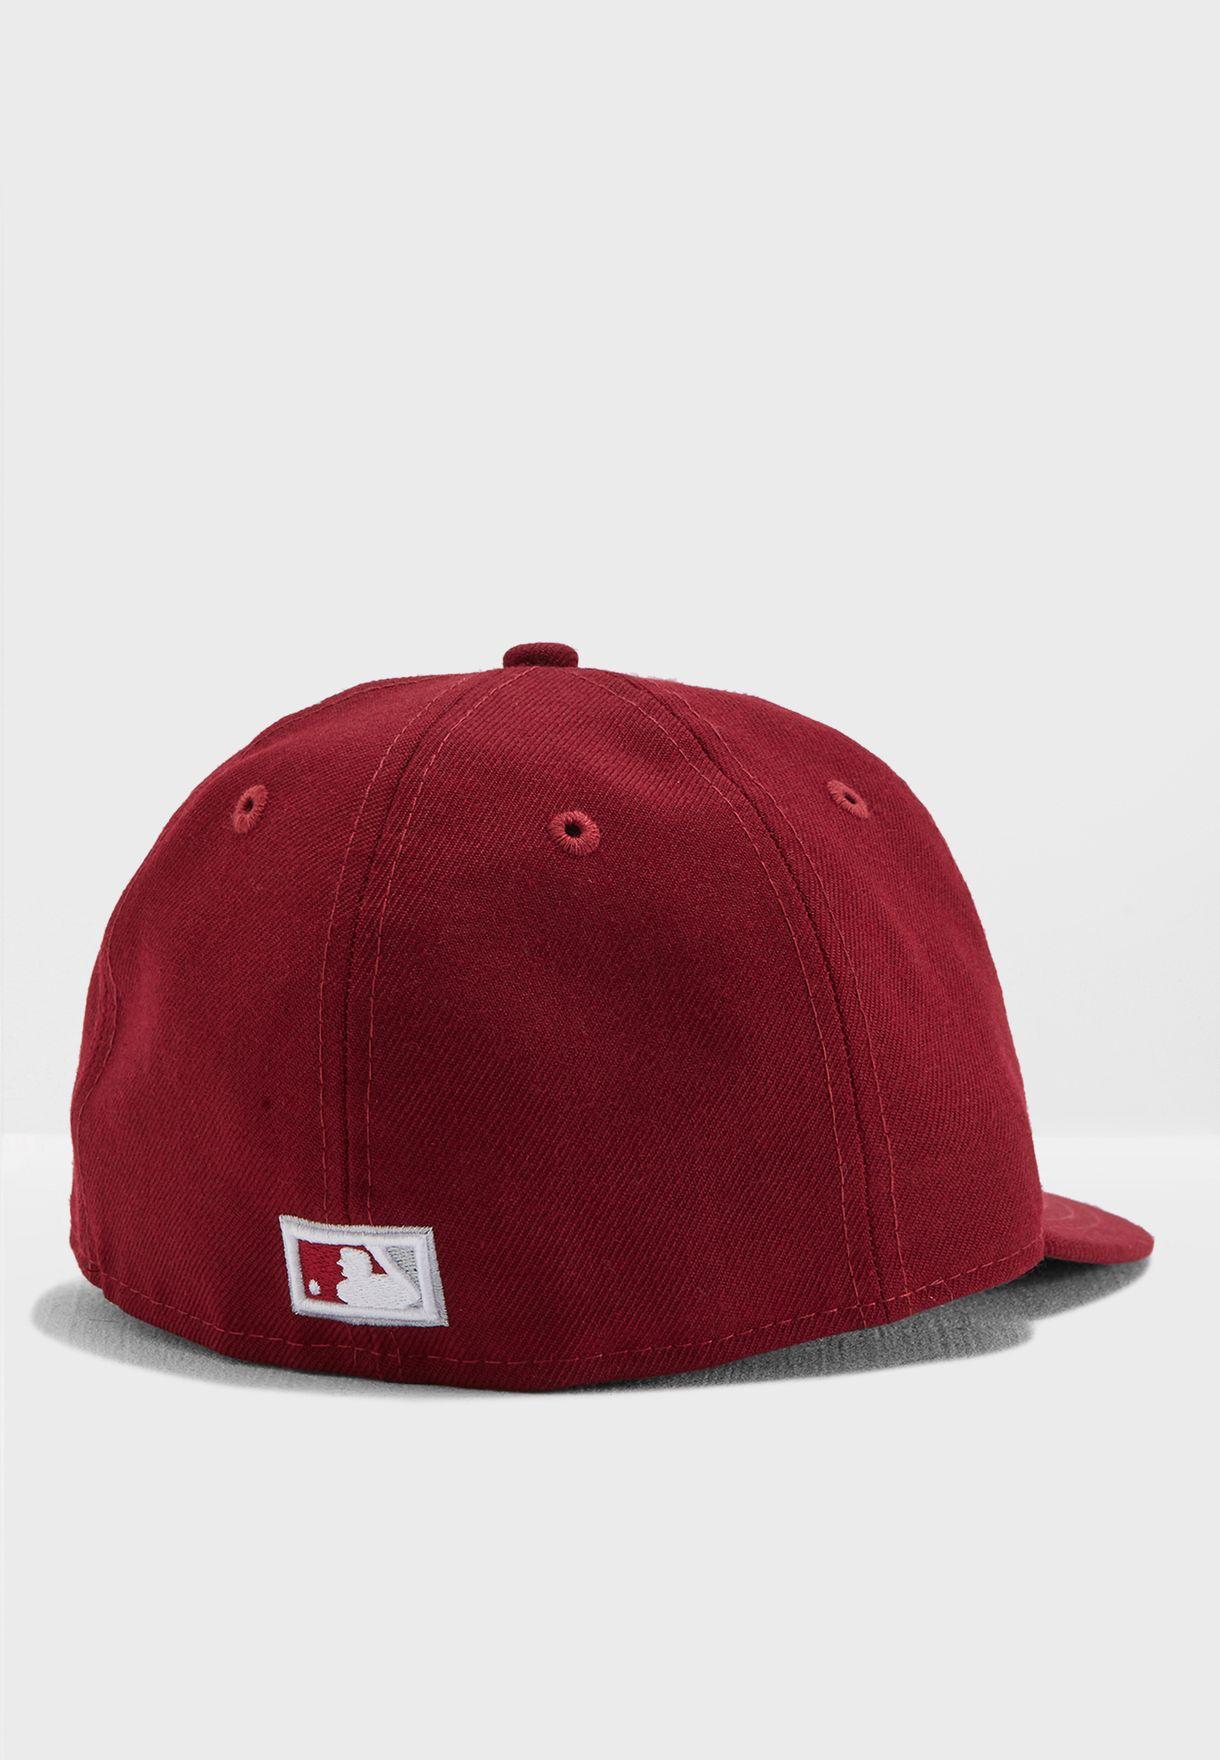 Shop New Era red 59Fifty Philadelphia Phillies Snapback 11757612 for ... fb2d3d86bda